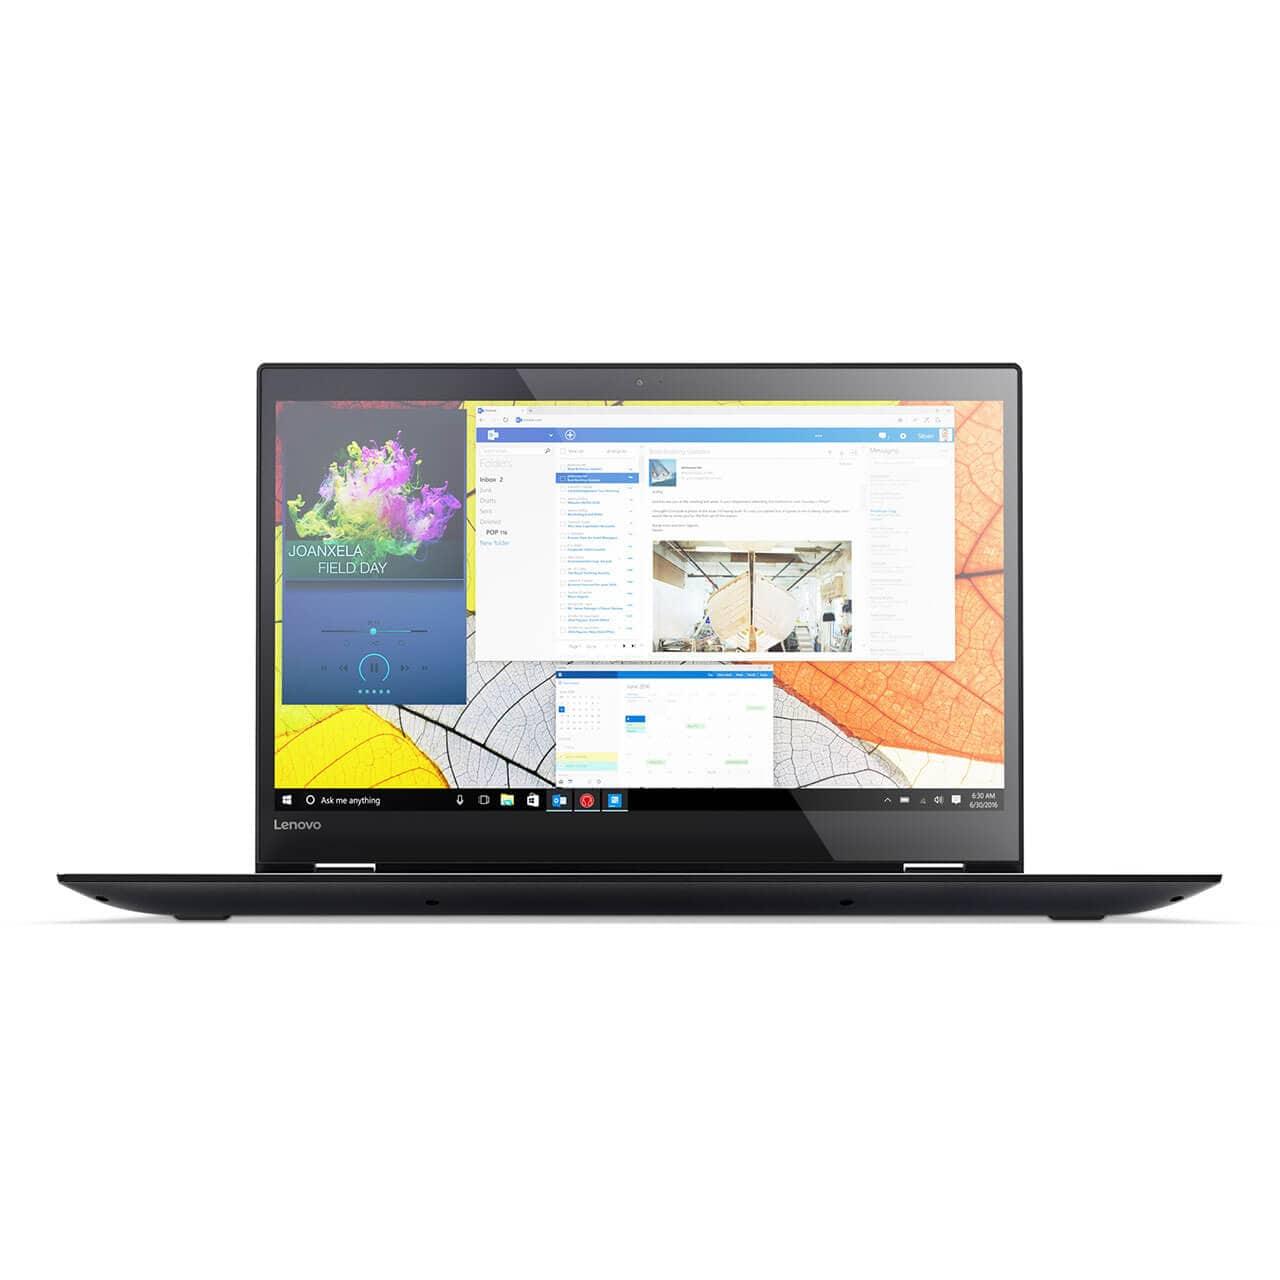 "Lenovo Flex 15, 15.6"", i7-8550U, 16 GB RAM, 512GB SSD, Win 10 Home 64, 1-Year Depot or Carry-in Warranty: $760 AC + Free Shipping"